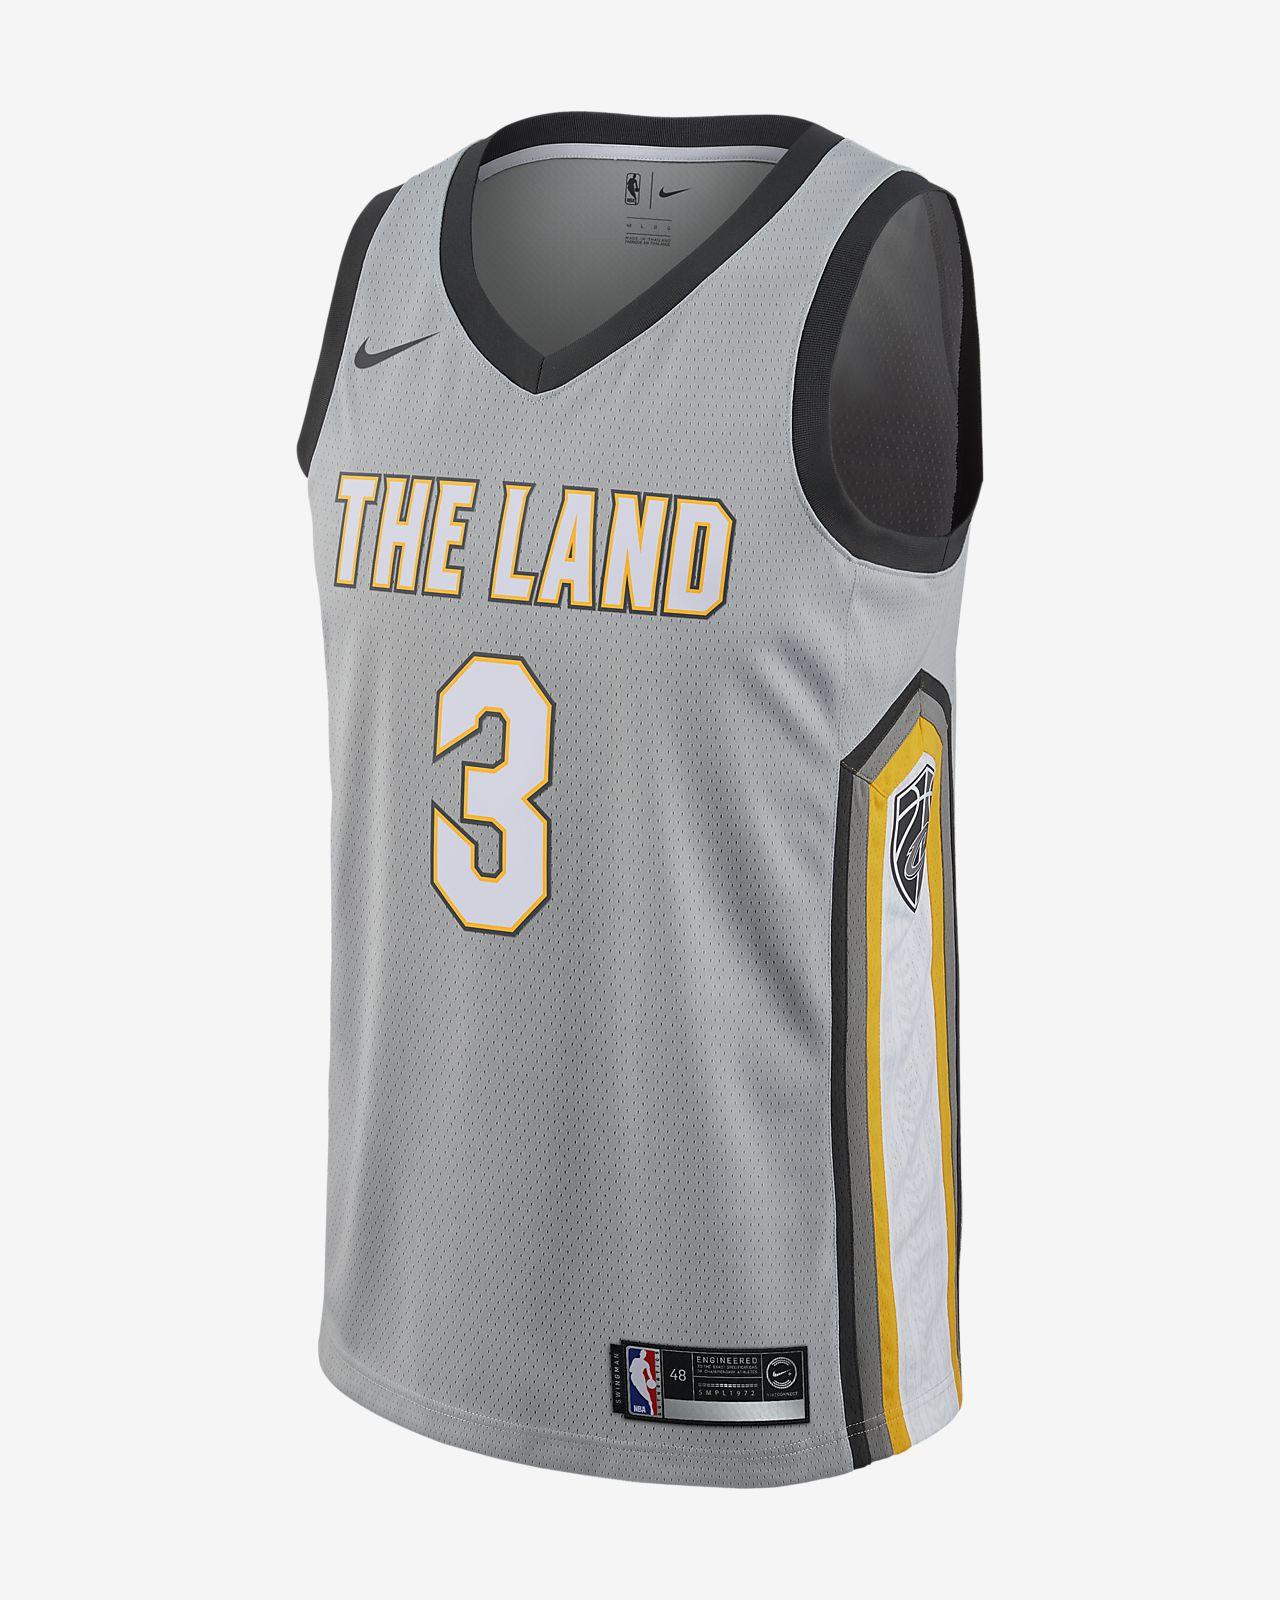 b136b25b3e9a8 ... Camiseta Nike NBA para hombre Isaiah Thomas City Edition Swingman  Jersey (Cleveland Cavaliers)